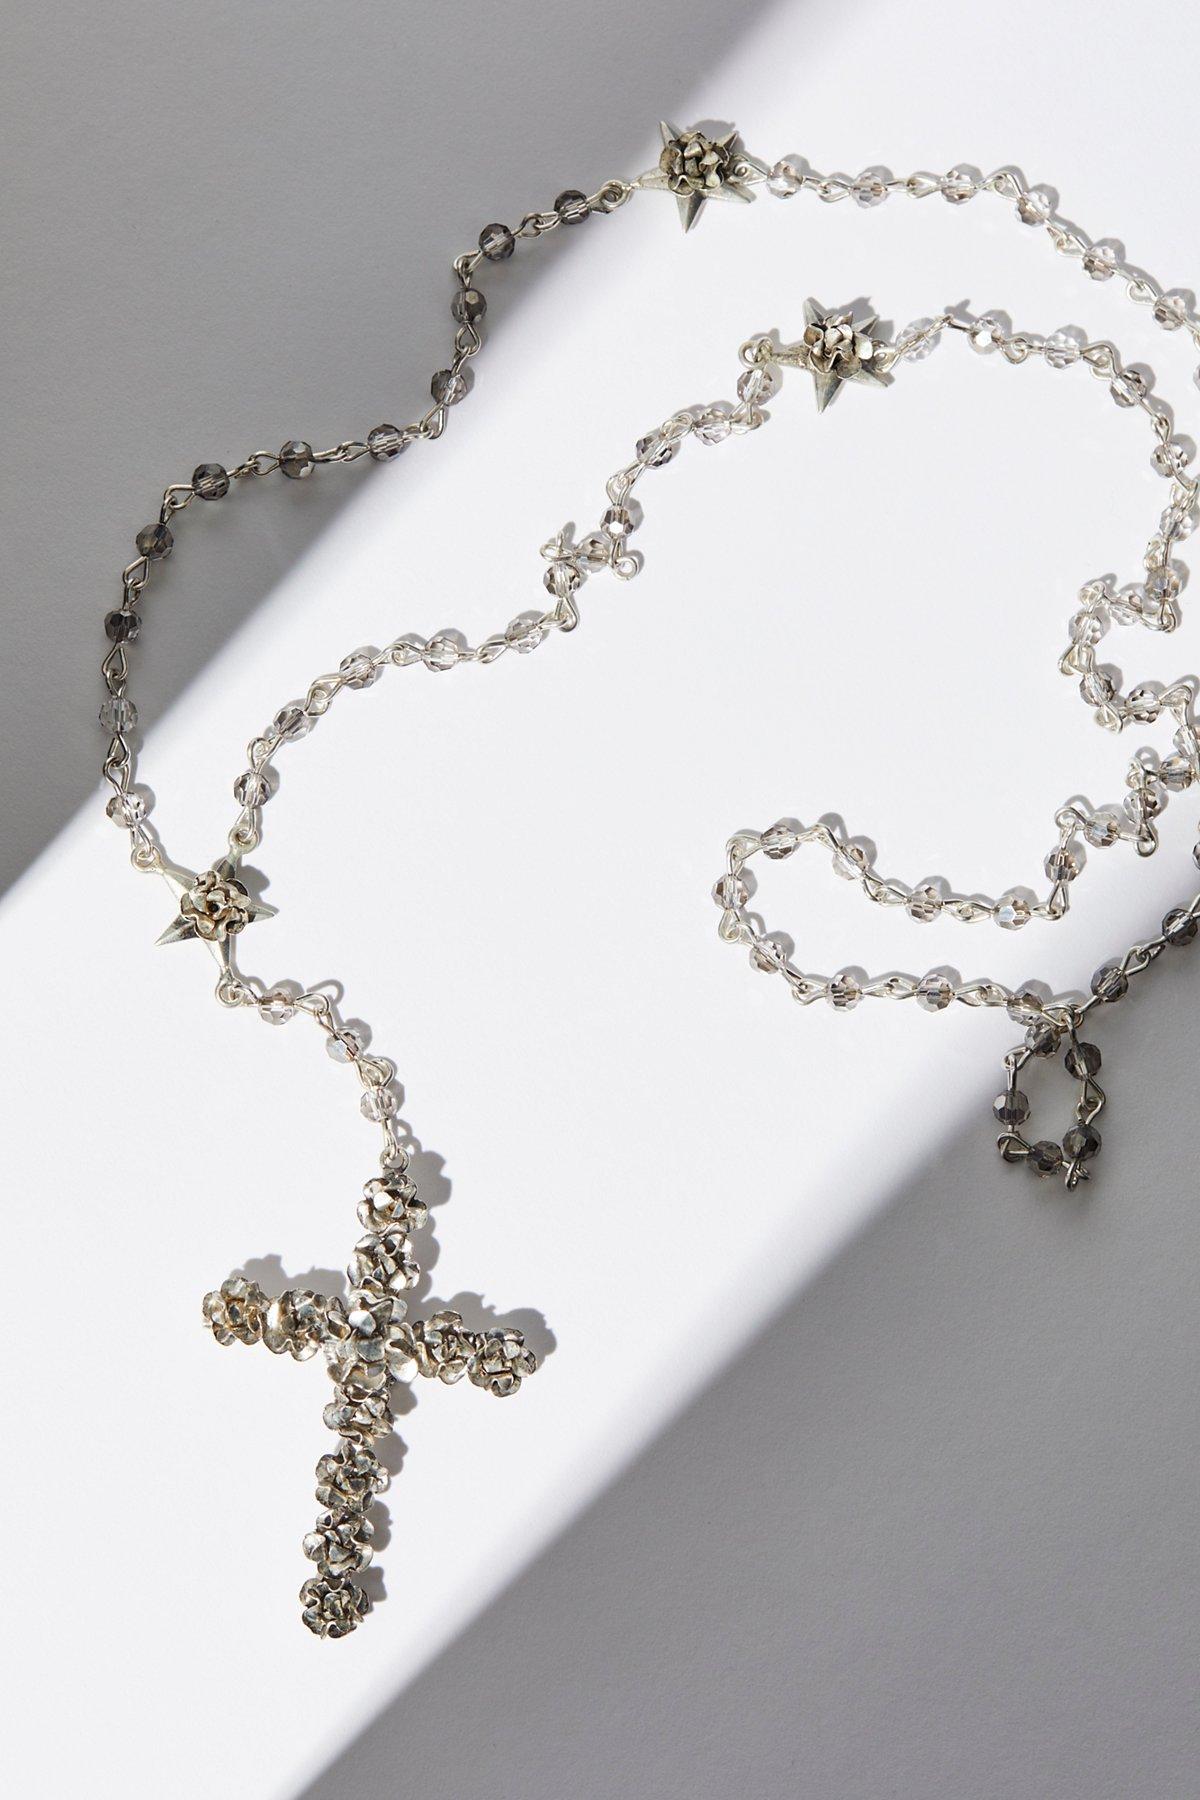 Coronation水晶念珠项链